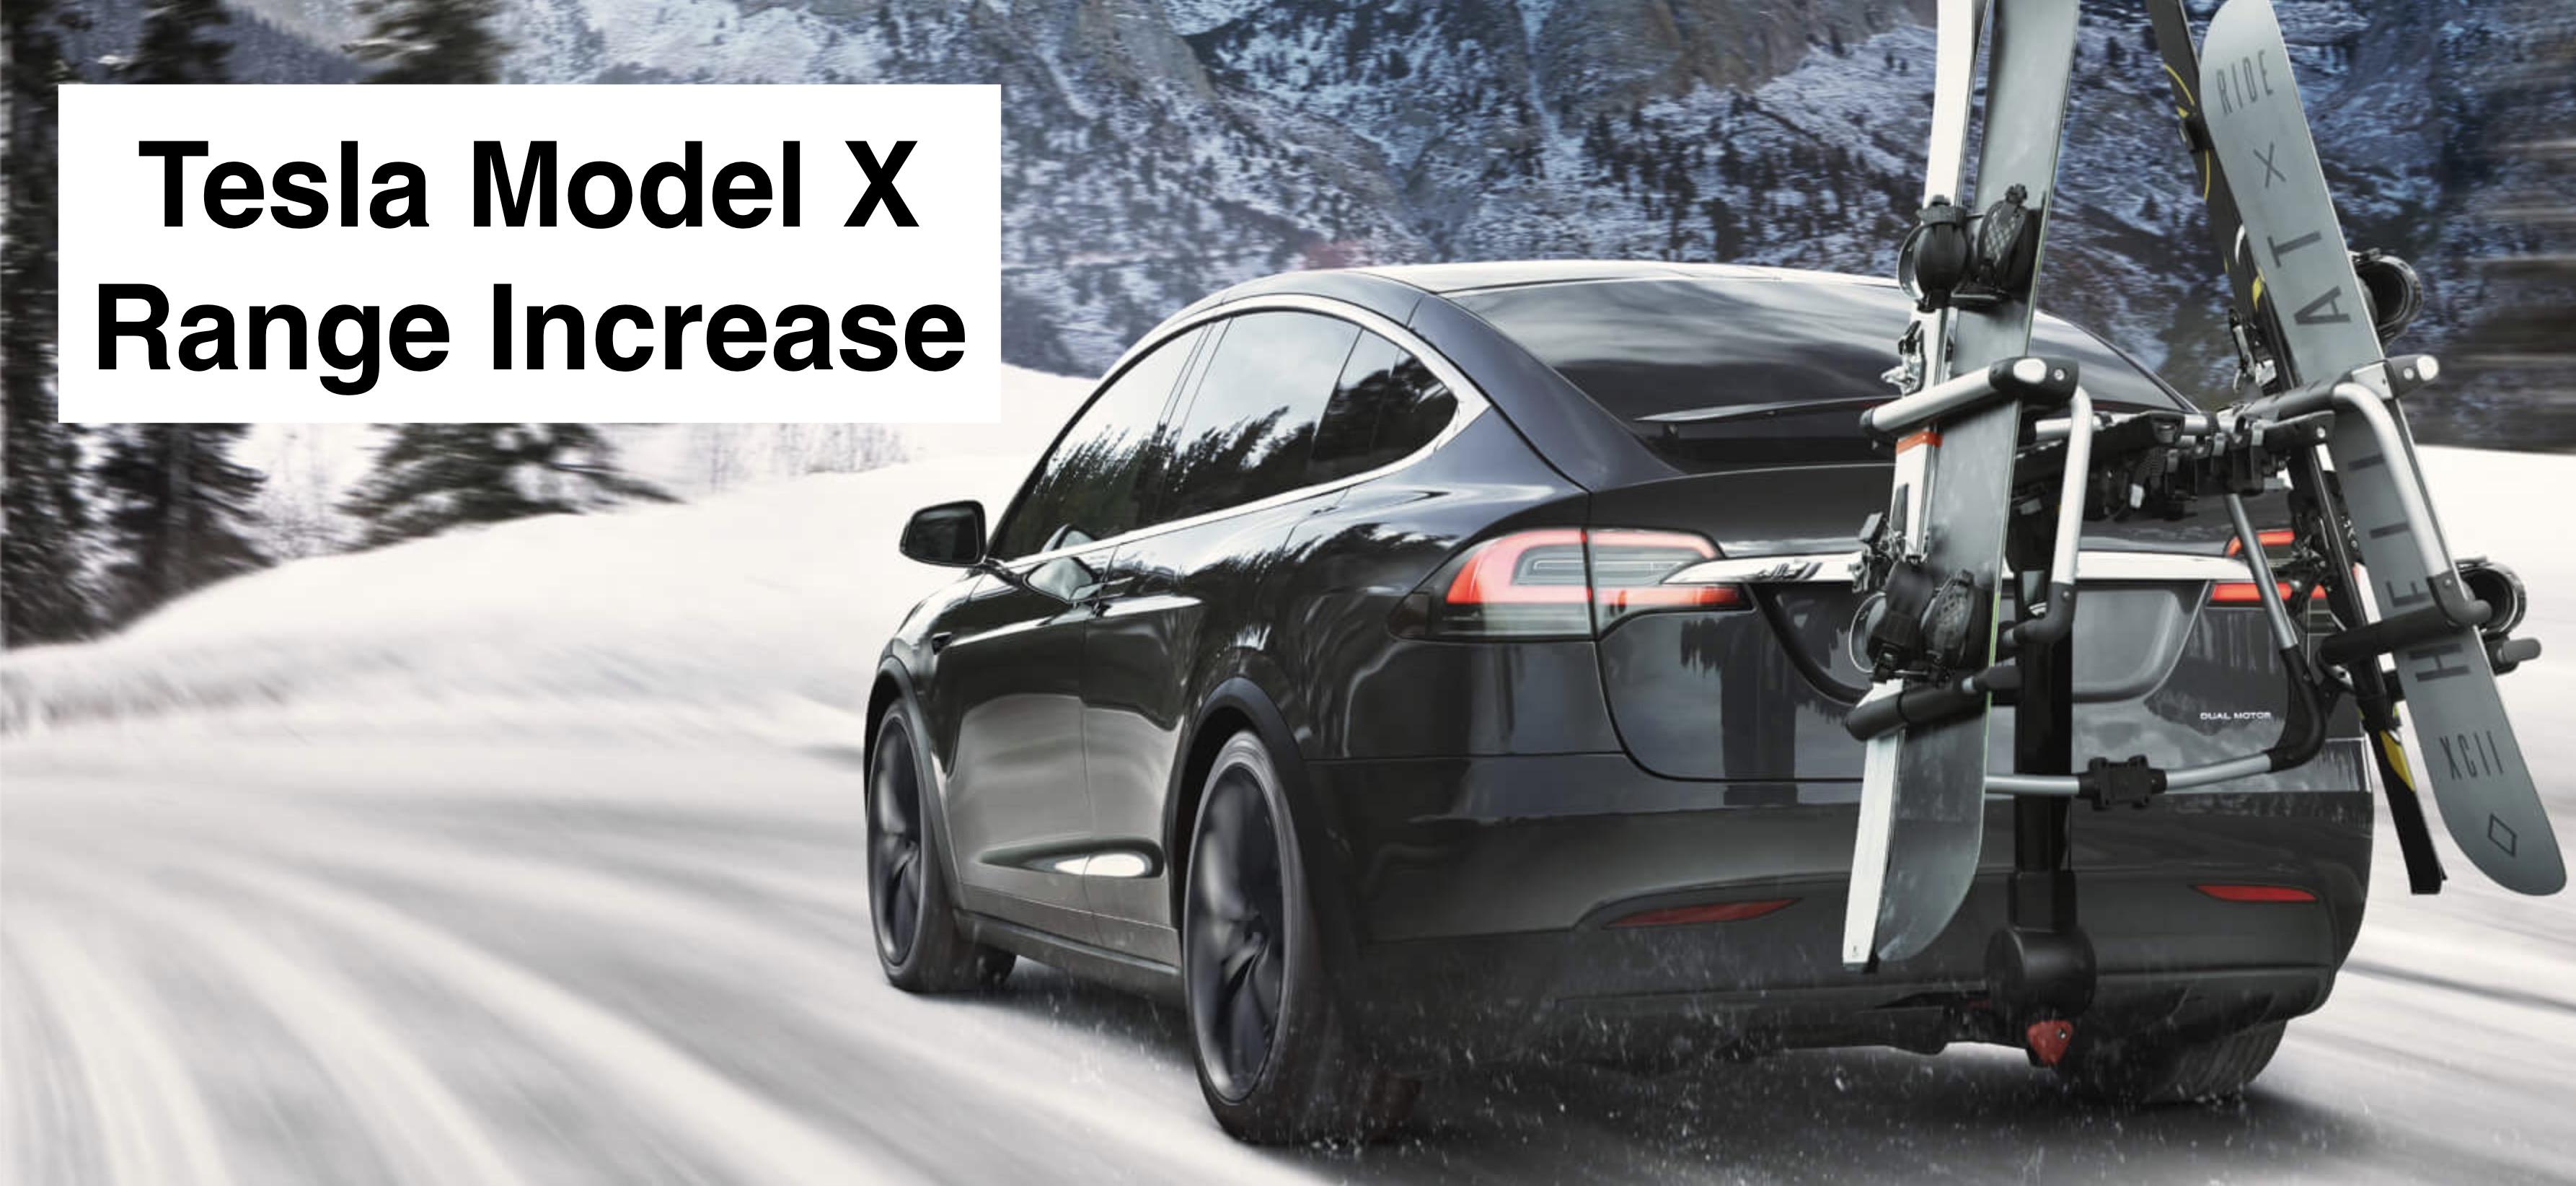 Tesla gives Model X range increase with 2021 version  image